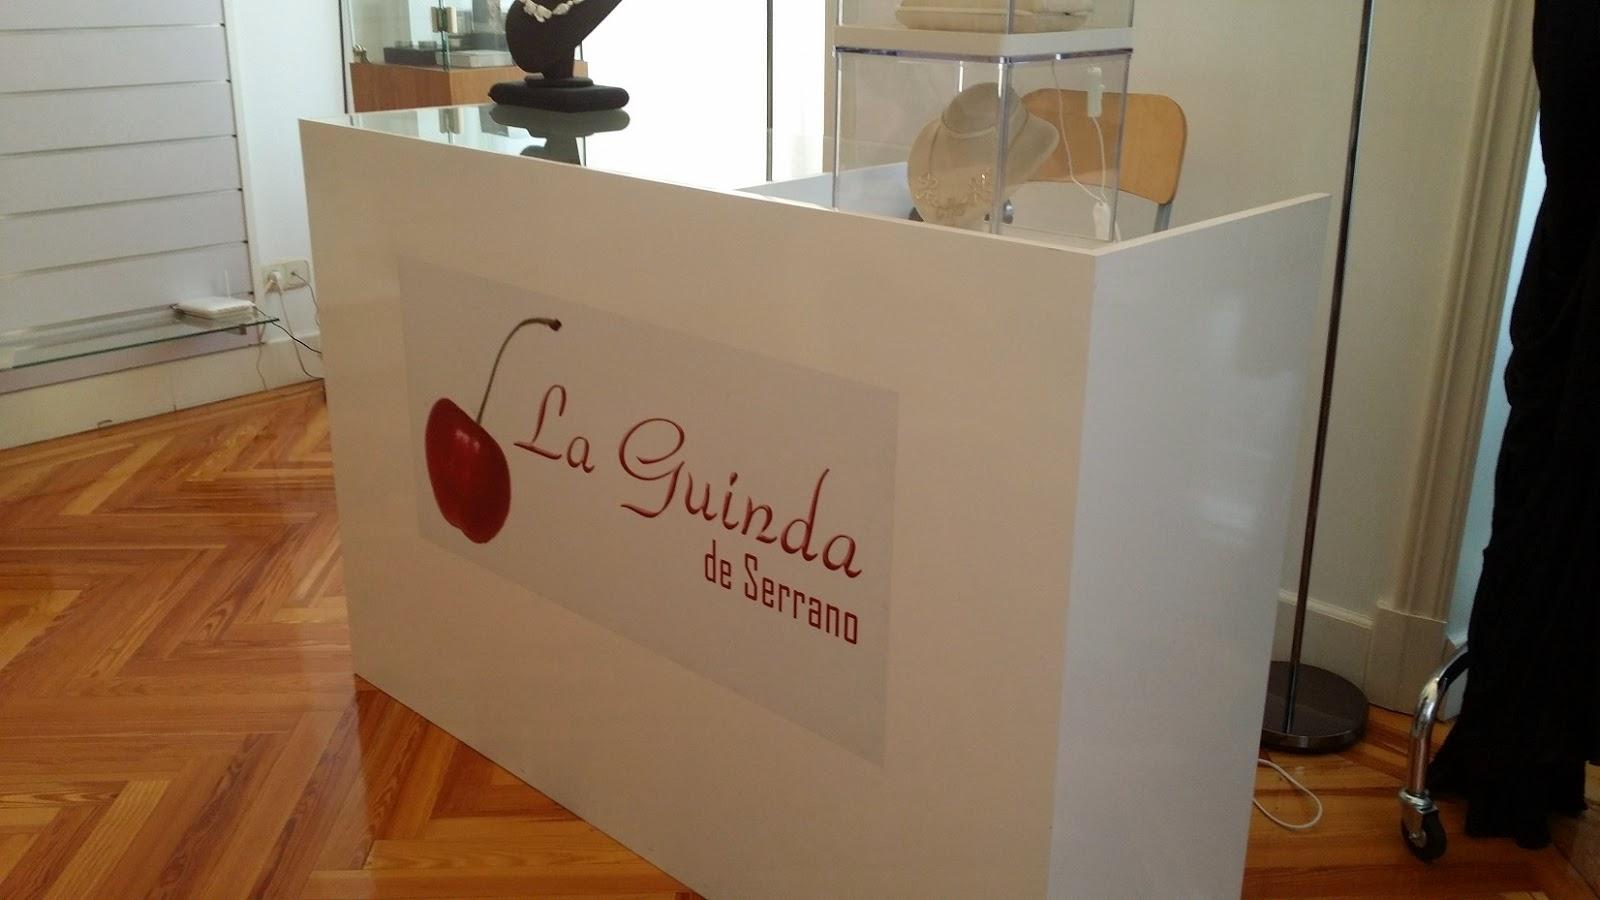 La Guinda de Serrano, showroom, street style, fashion style, MiCleo, Cosmética, Belleza, Complementos